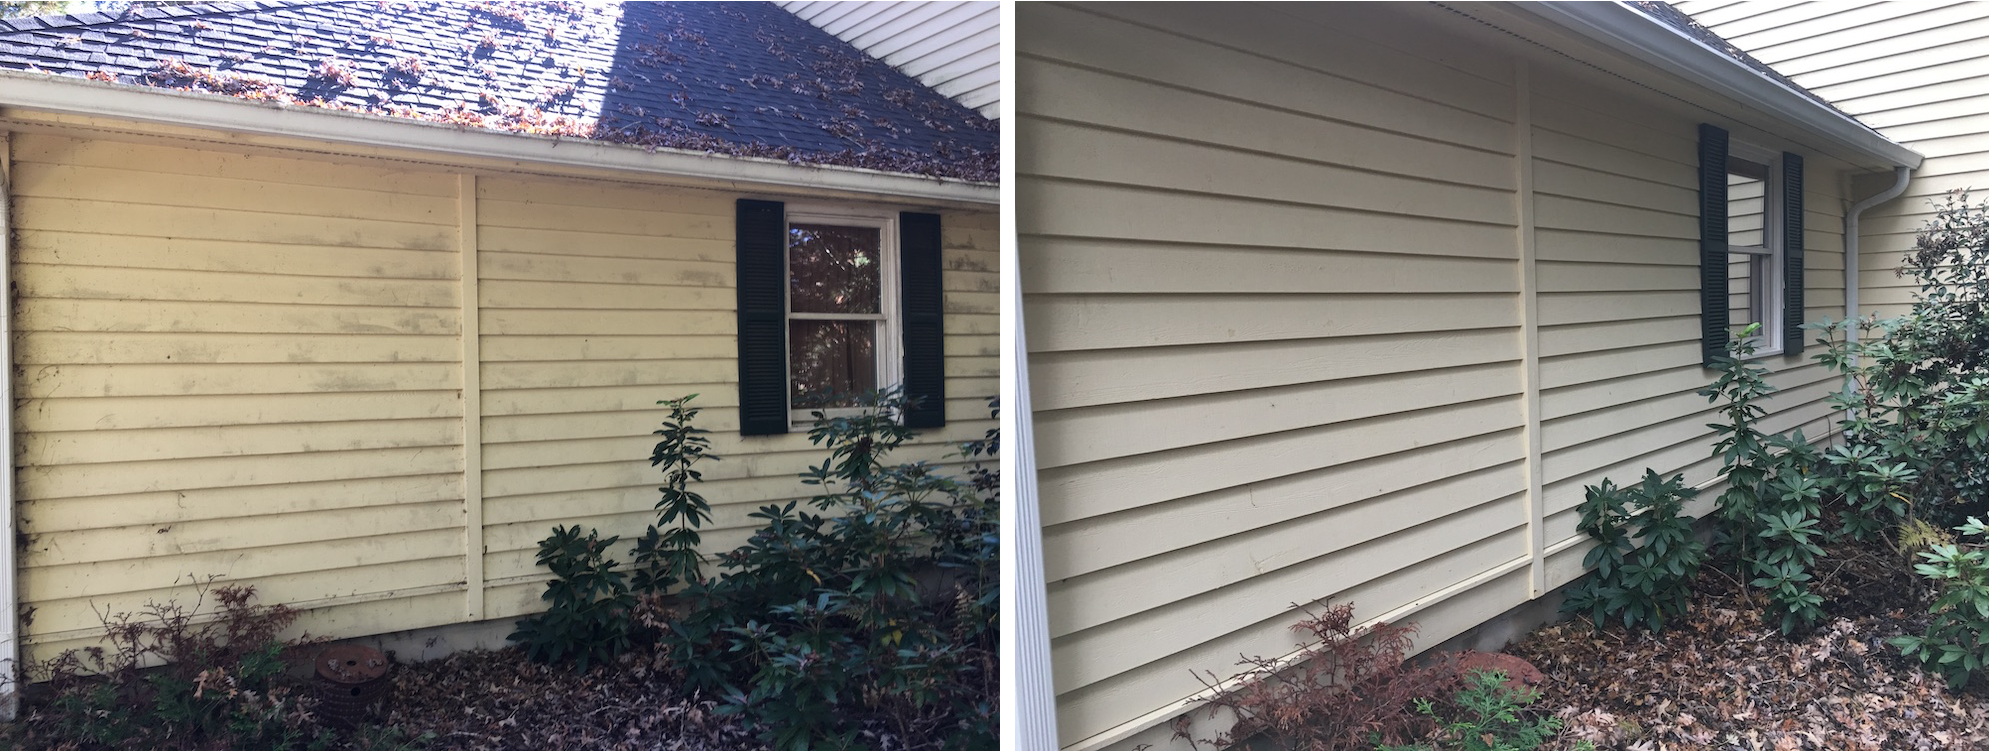 Exterior House Washing Services | Remove Mildew & Algae Now